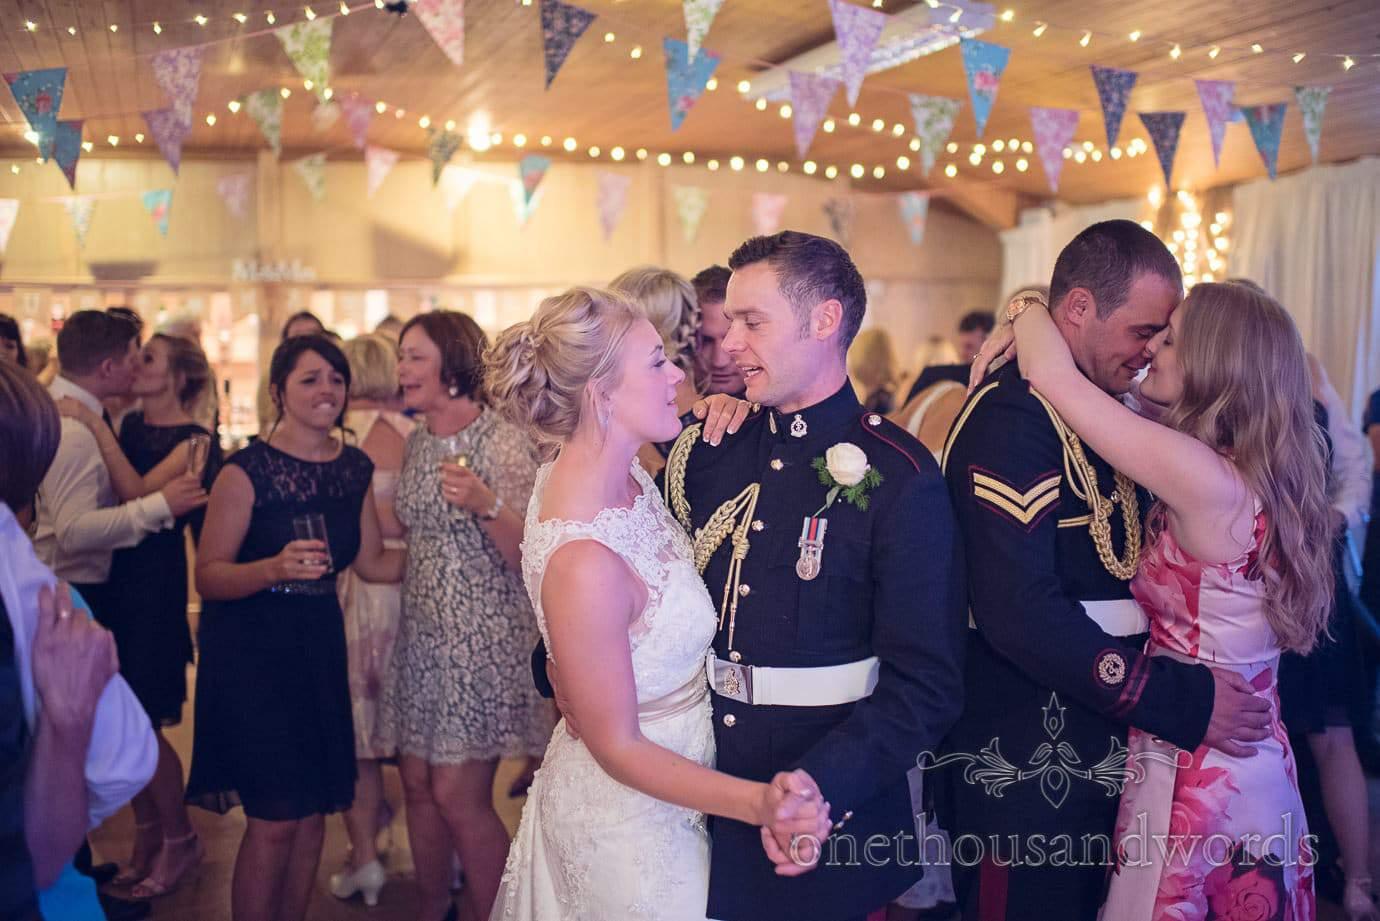 Military wedding dancing in uniform under bunting at Wareham Rugby Club wedding